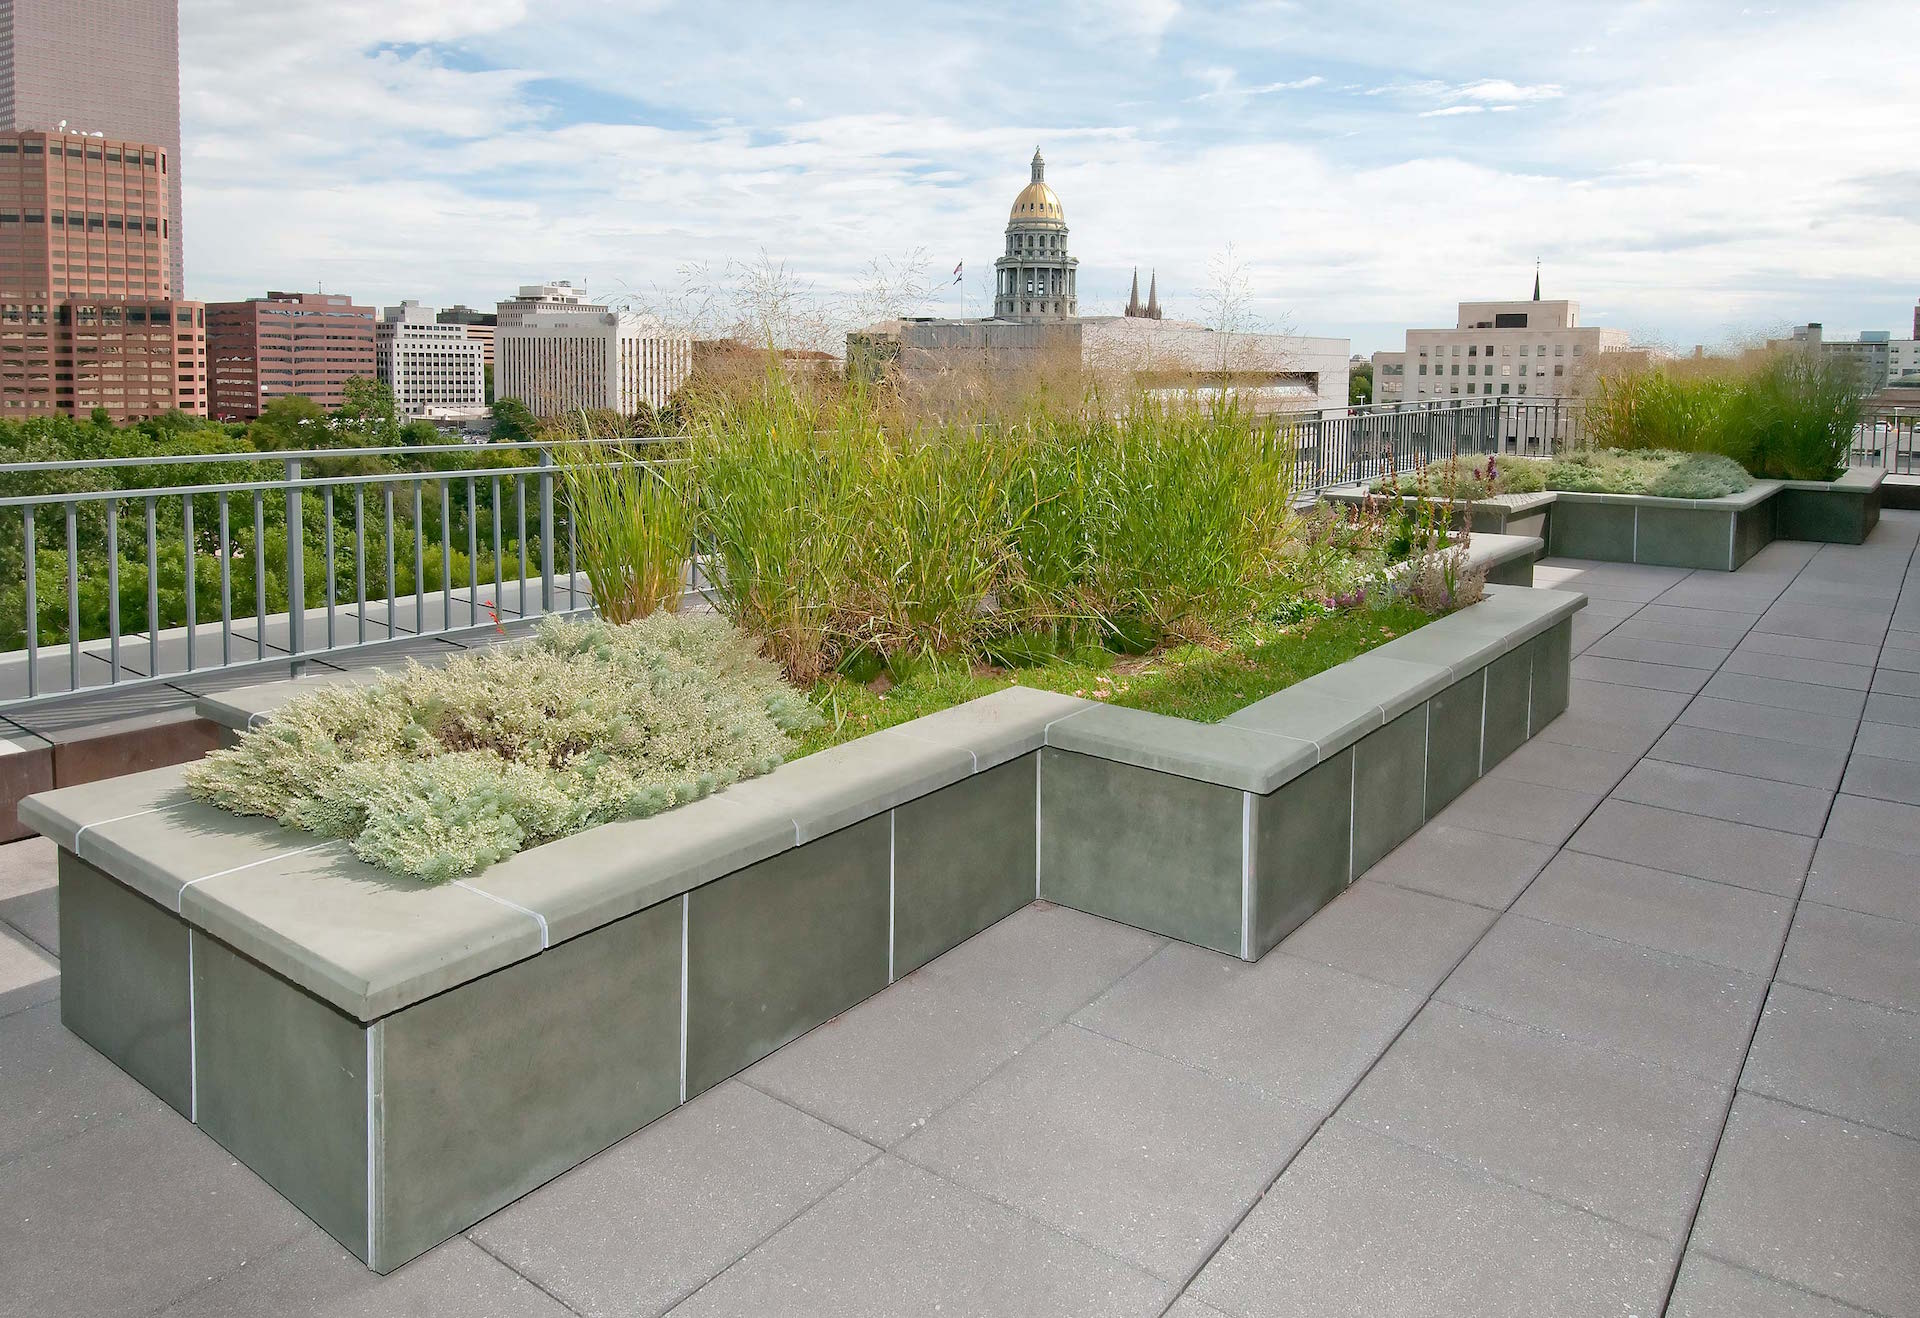 Denver Public Library Green Roof Lime Green Design Lime